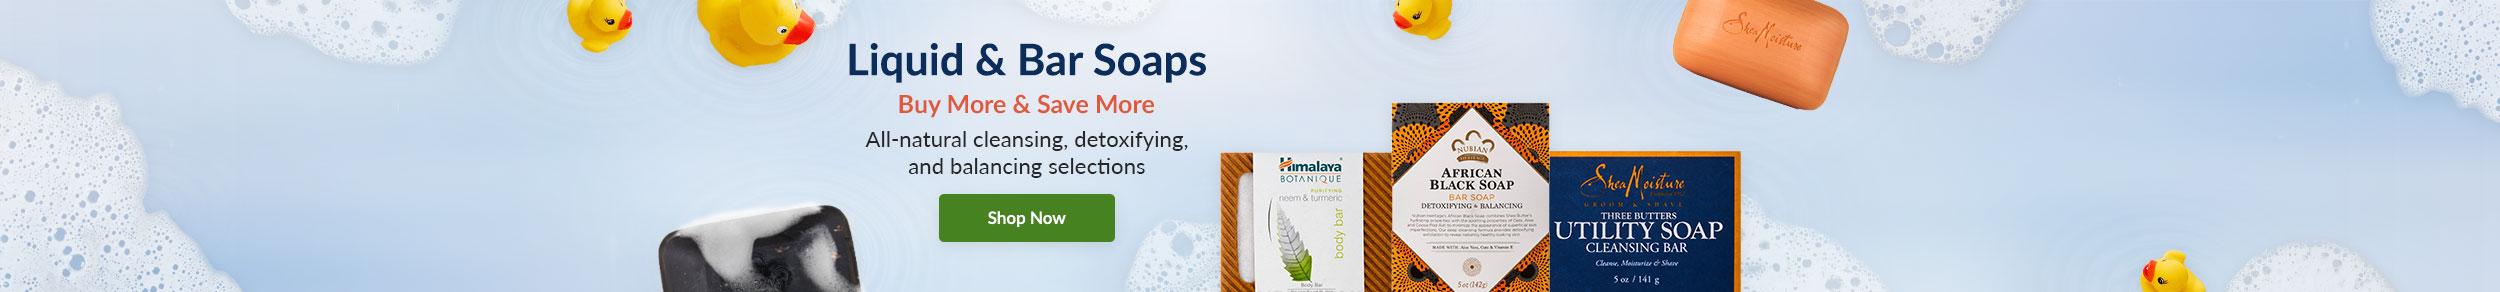 https://i3.pureformulas.net/images/static/Soap-Essentials_Beauty-1_092118.jpg